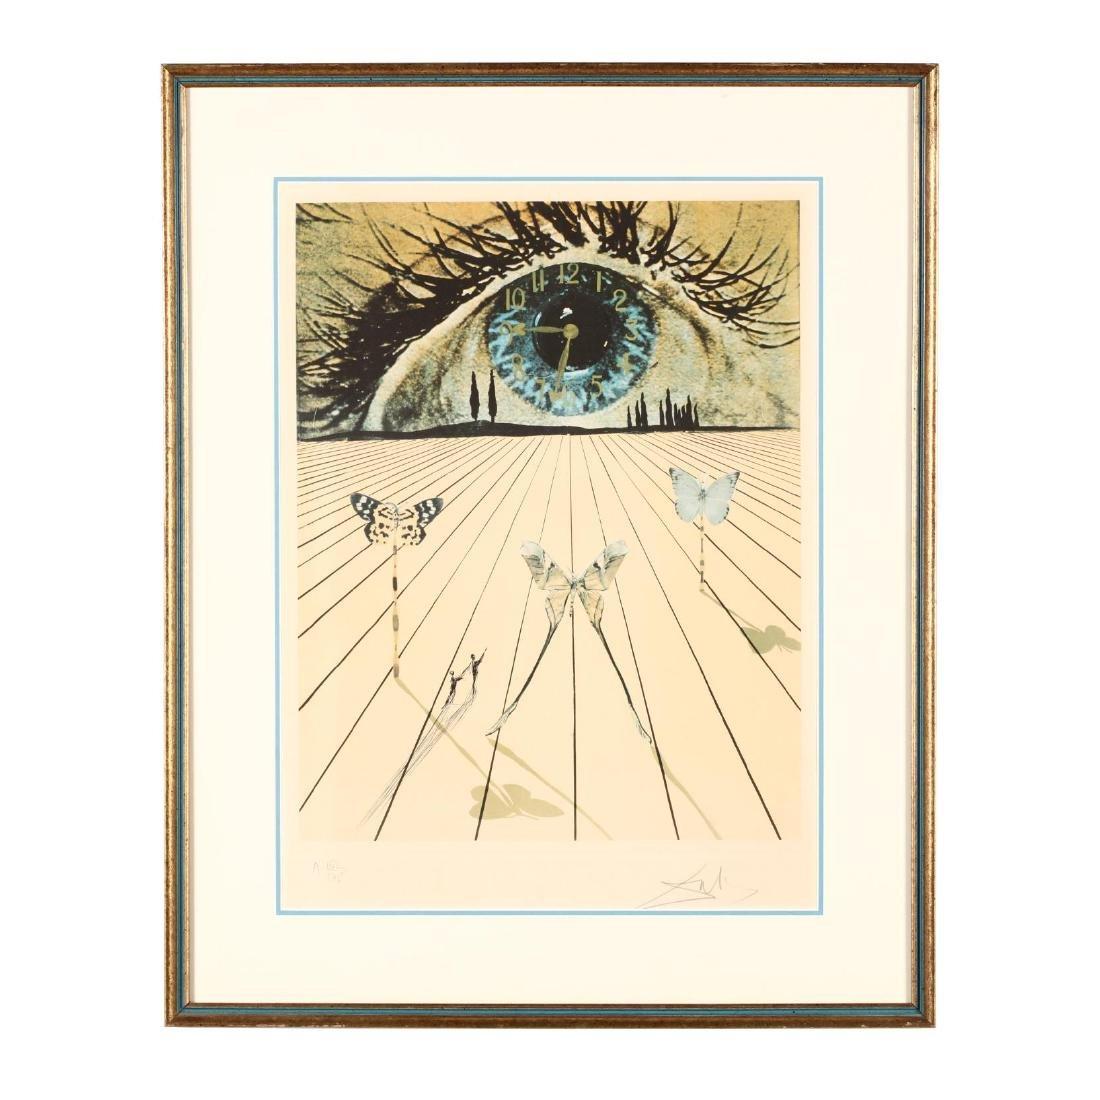 Salvador Dalí (Spanish, 1904-1989),  Eye of Surrealist